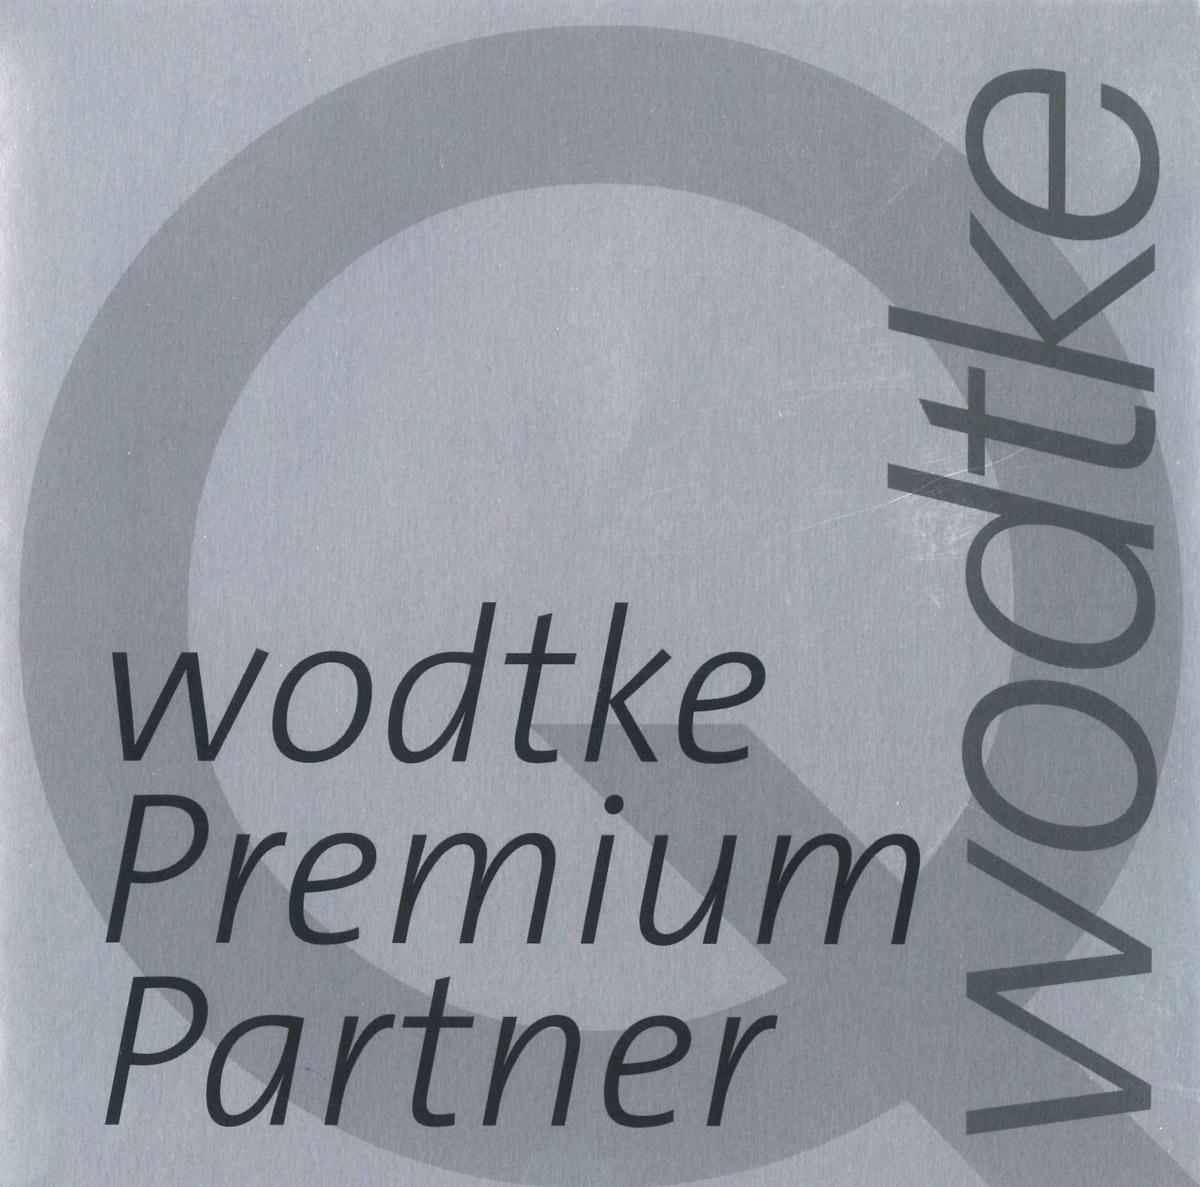 wodtke Premium Partner Logo